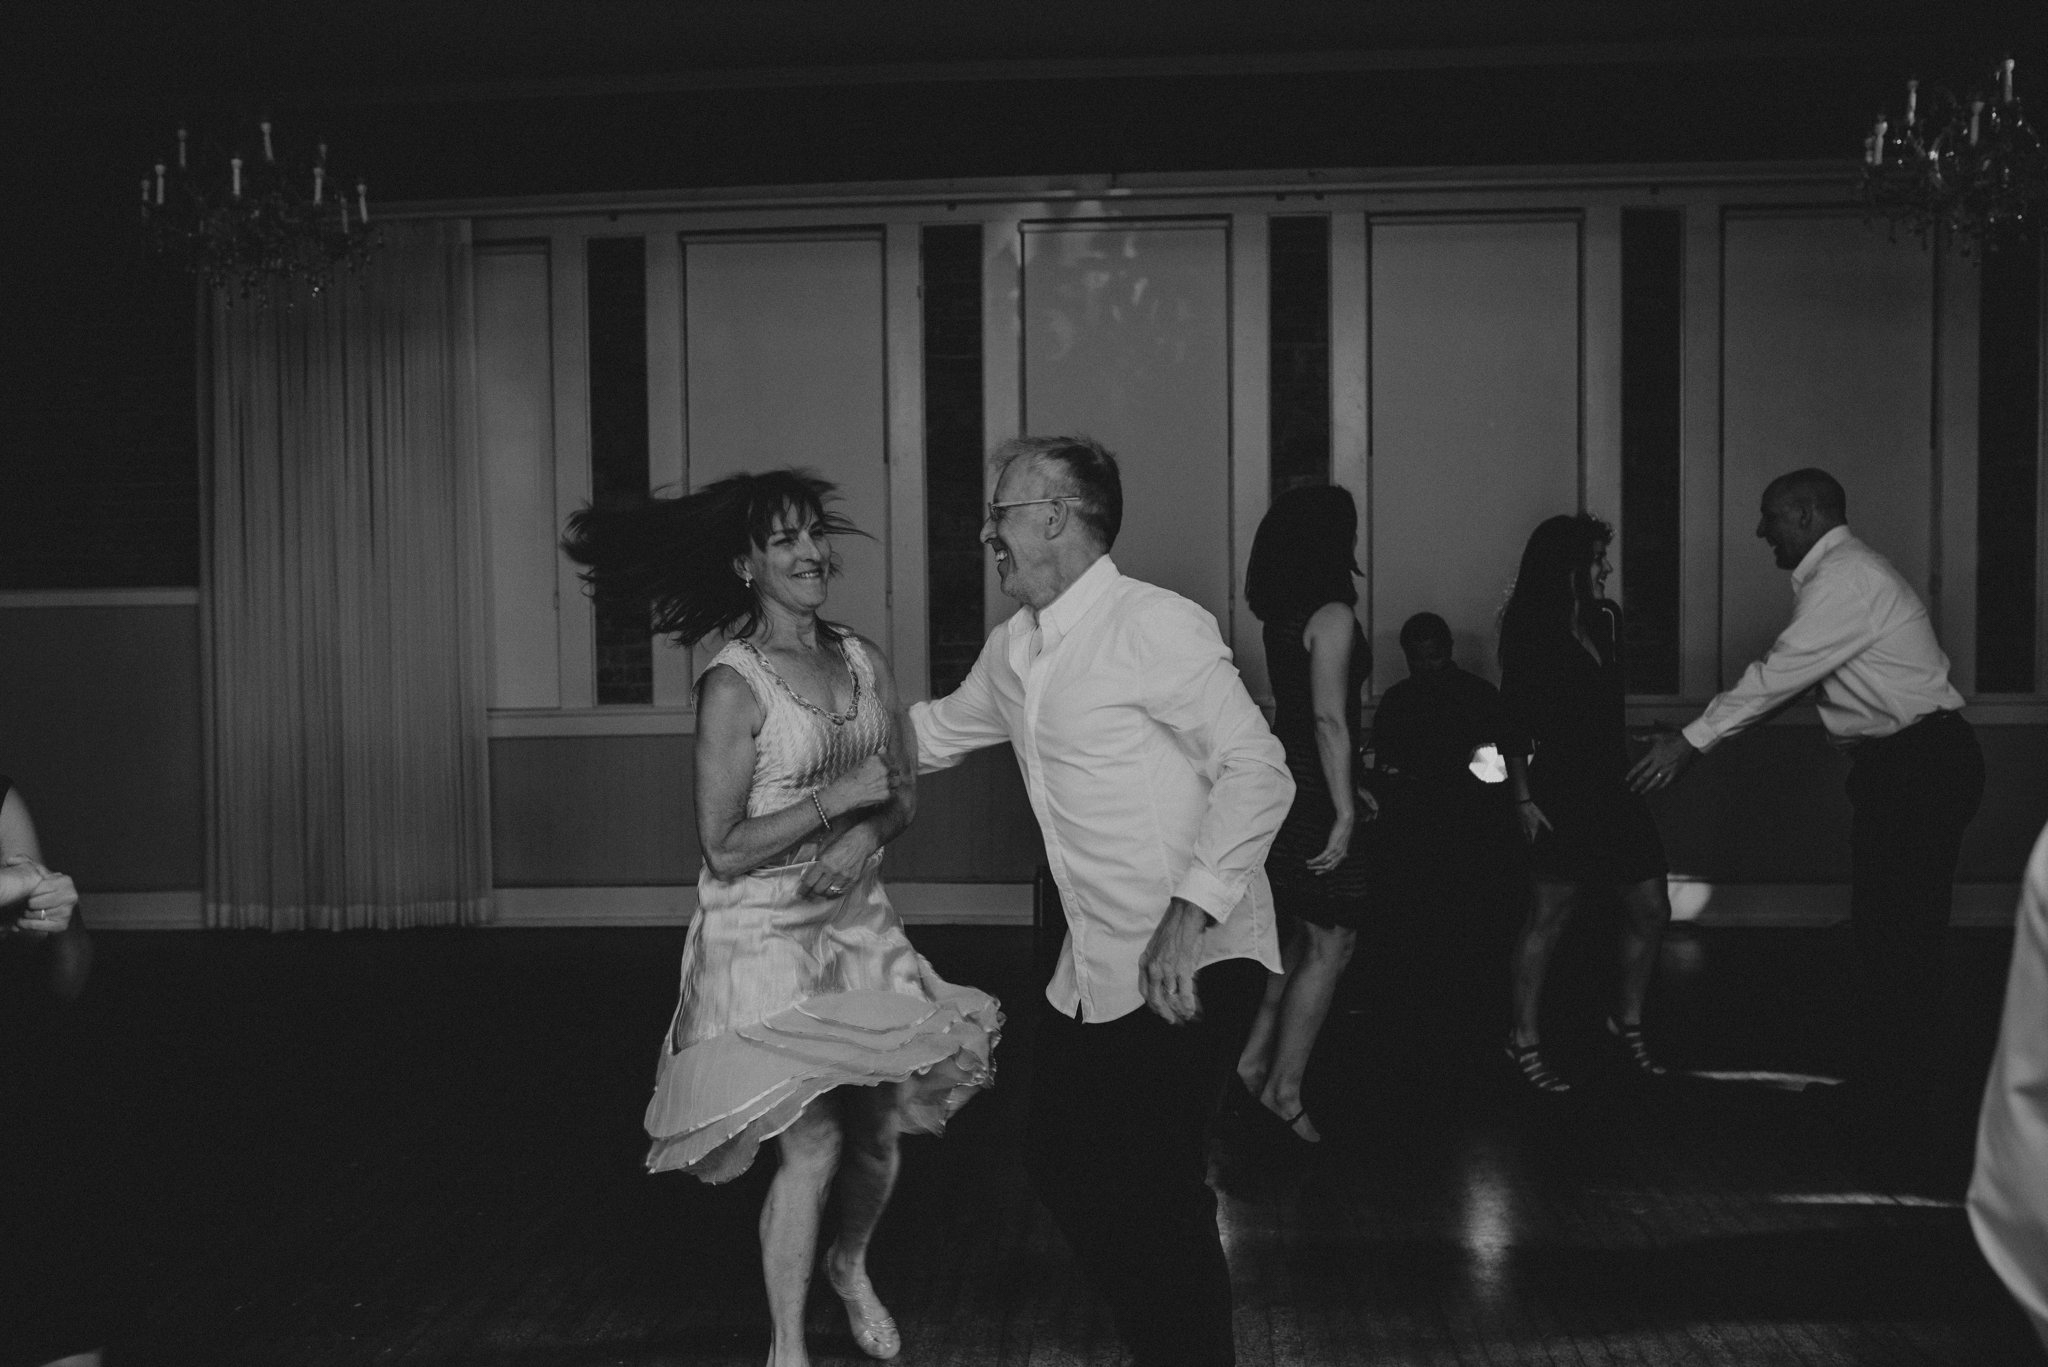 hollywood-school-house-wedding-seattle-photographer-caitlyn-nikula-120.jpg